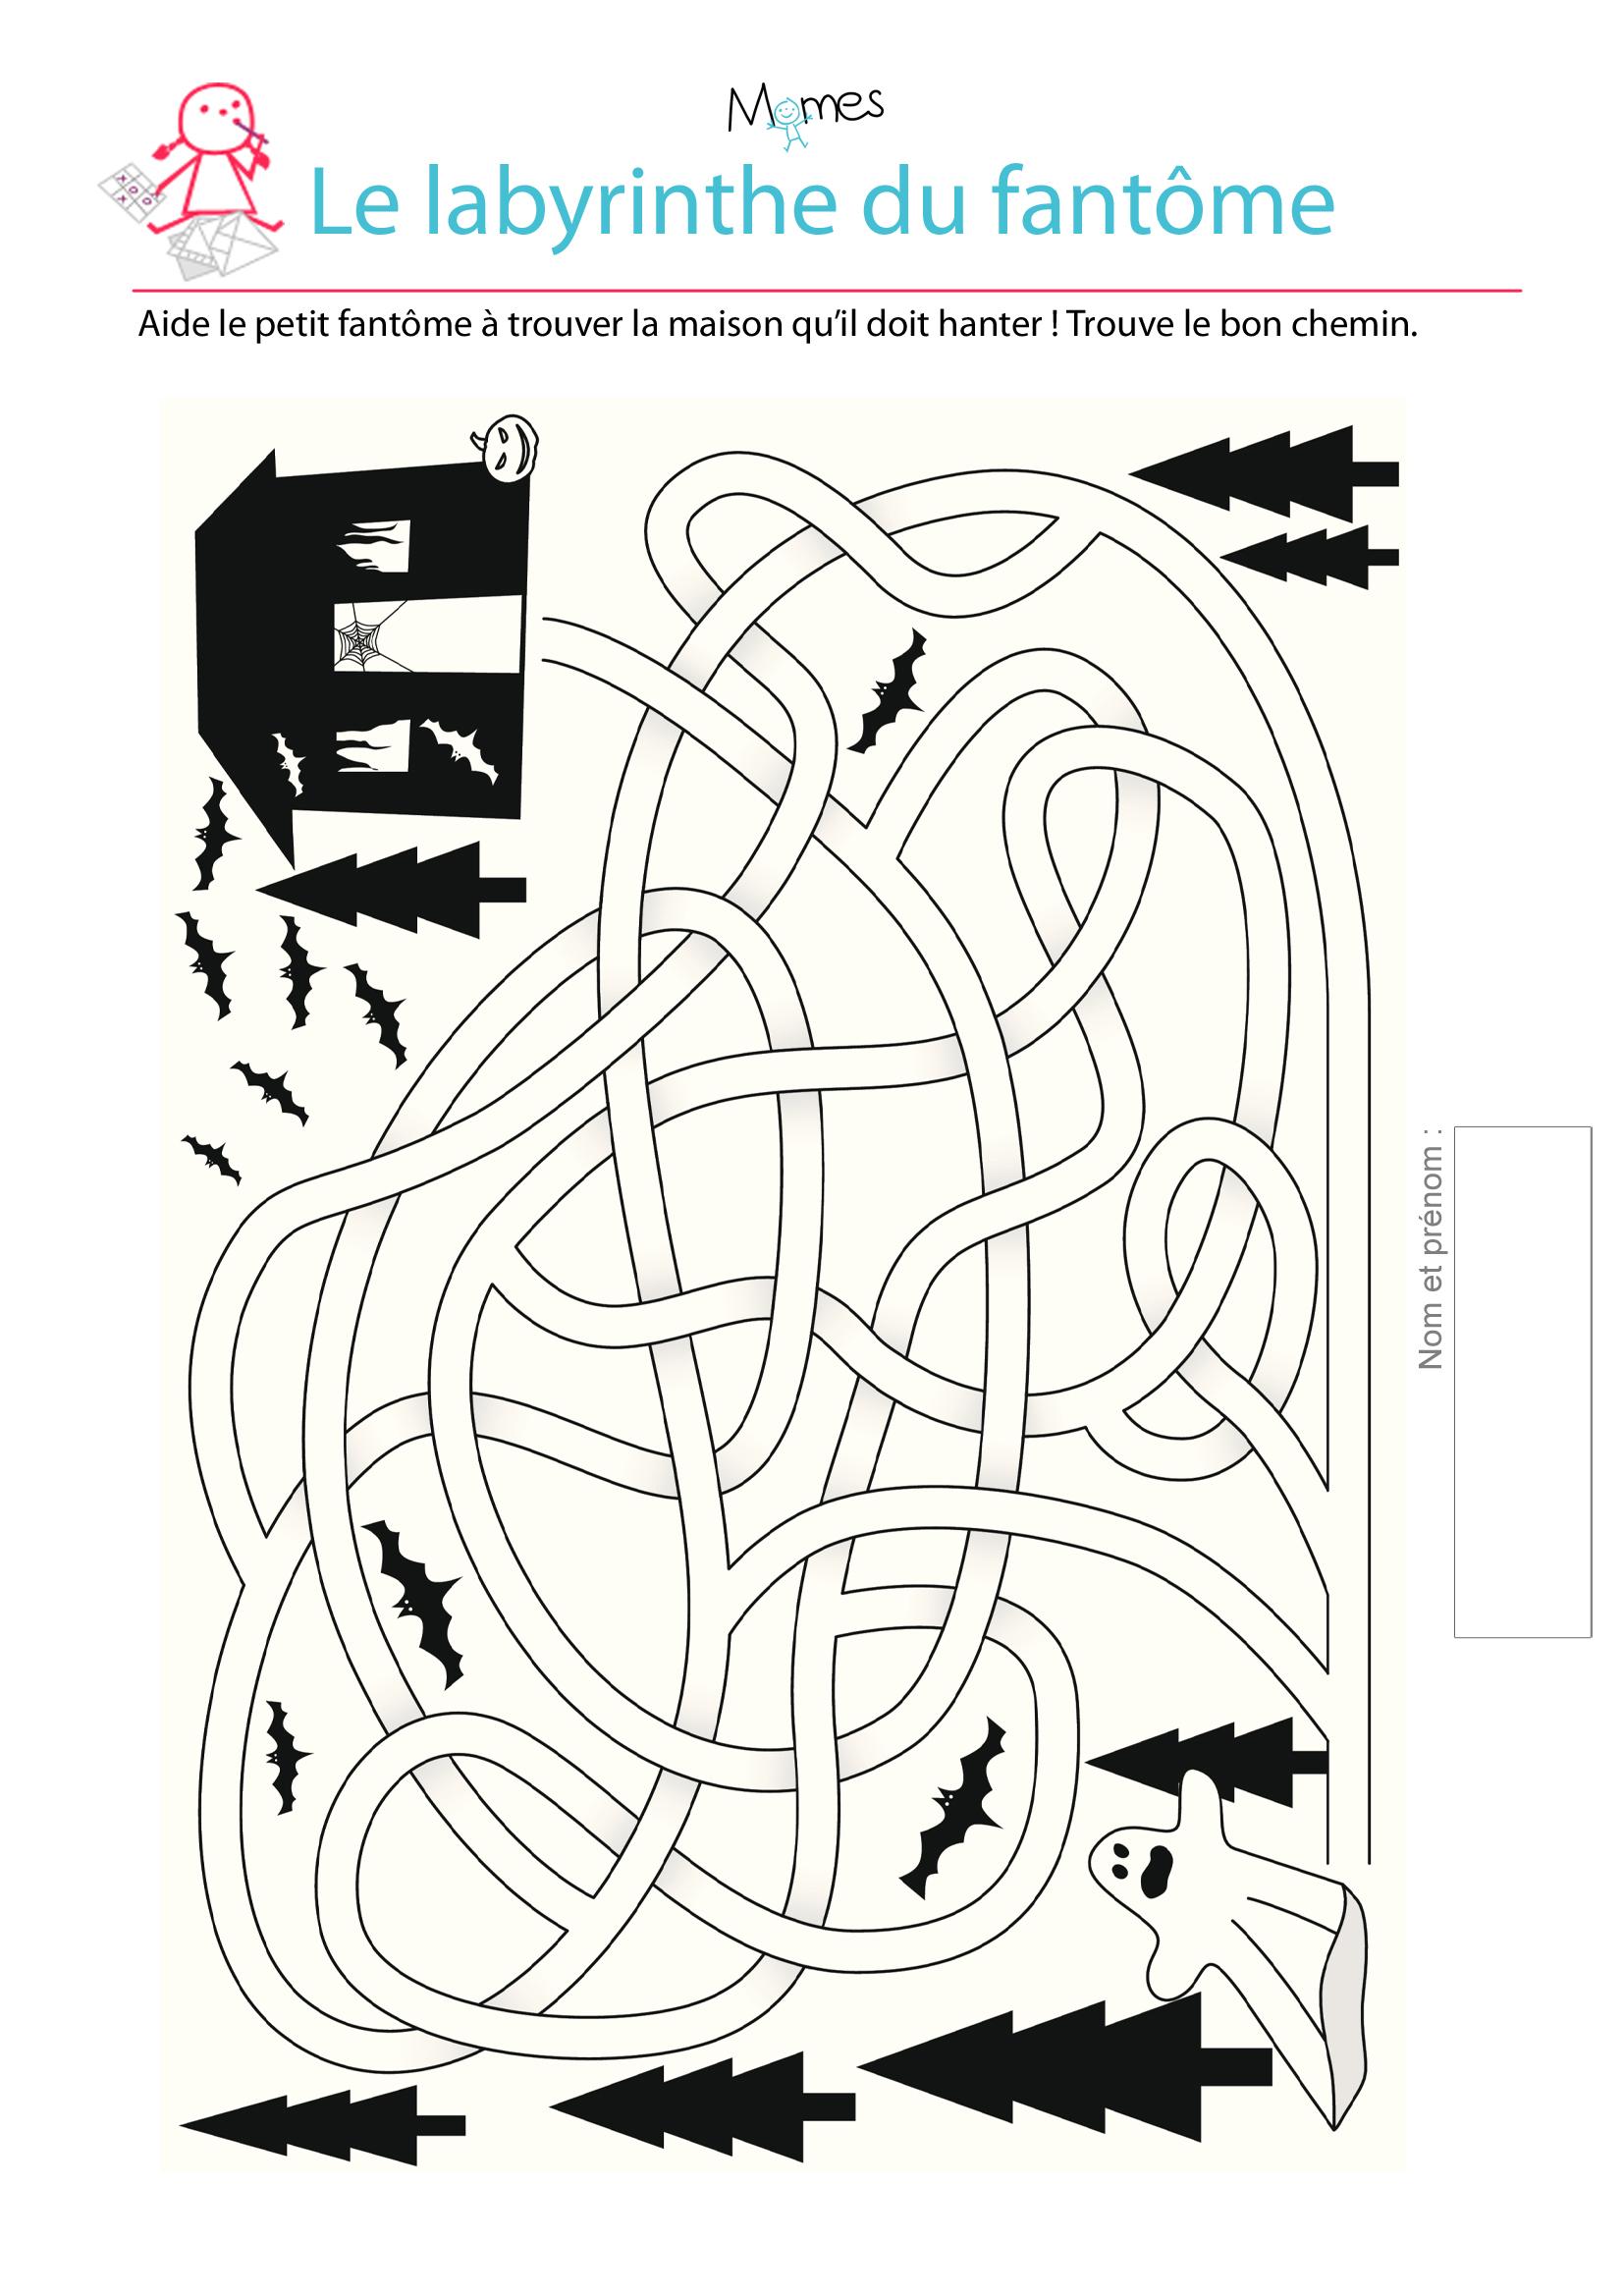 labyrinthe du fantome à imprimer